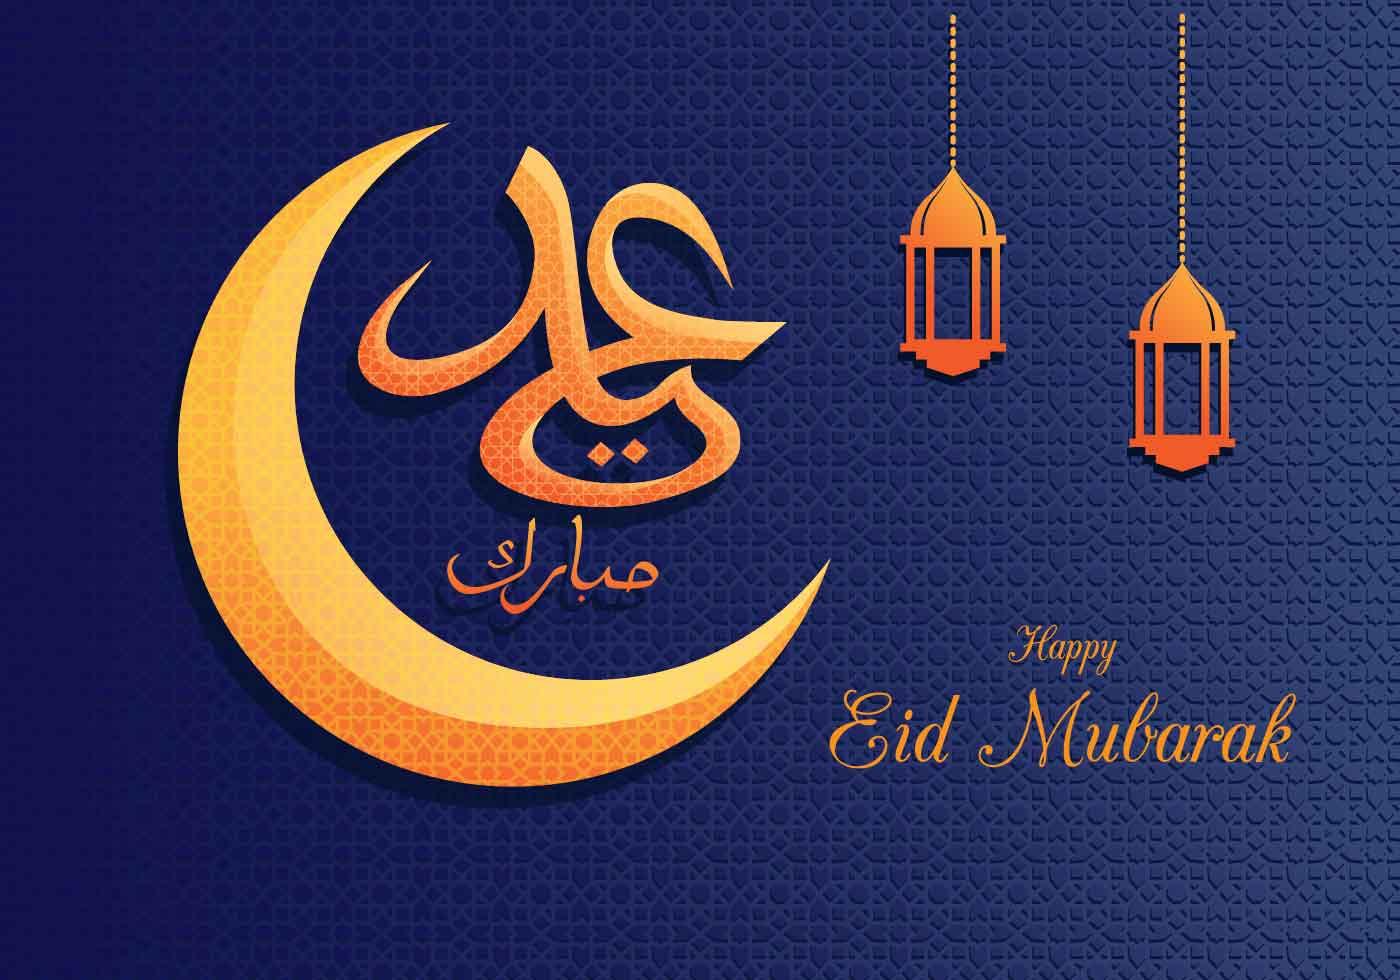 eid mubarak greeting background 558646  download free